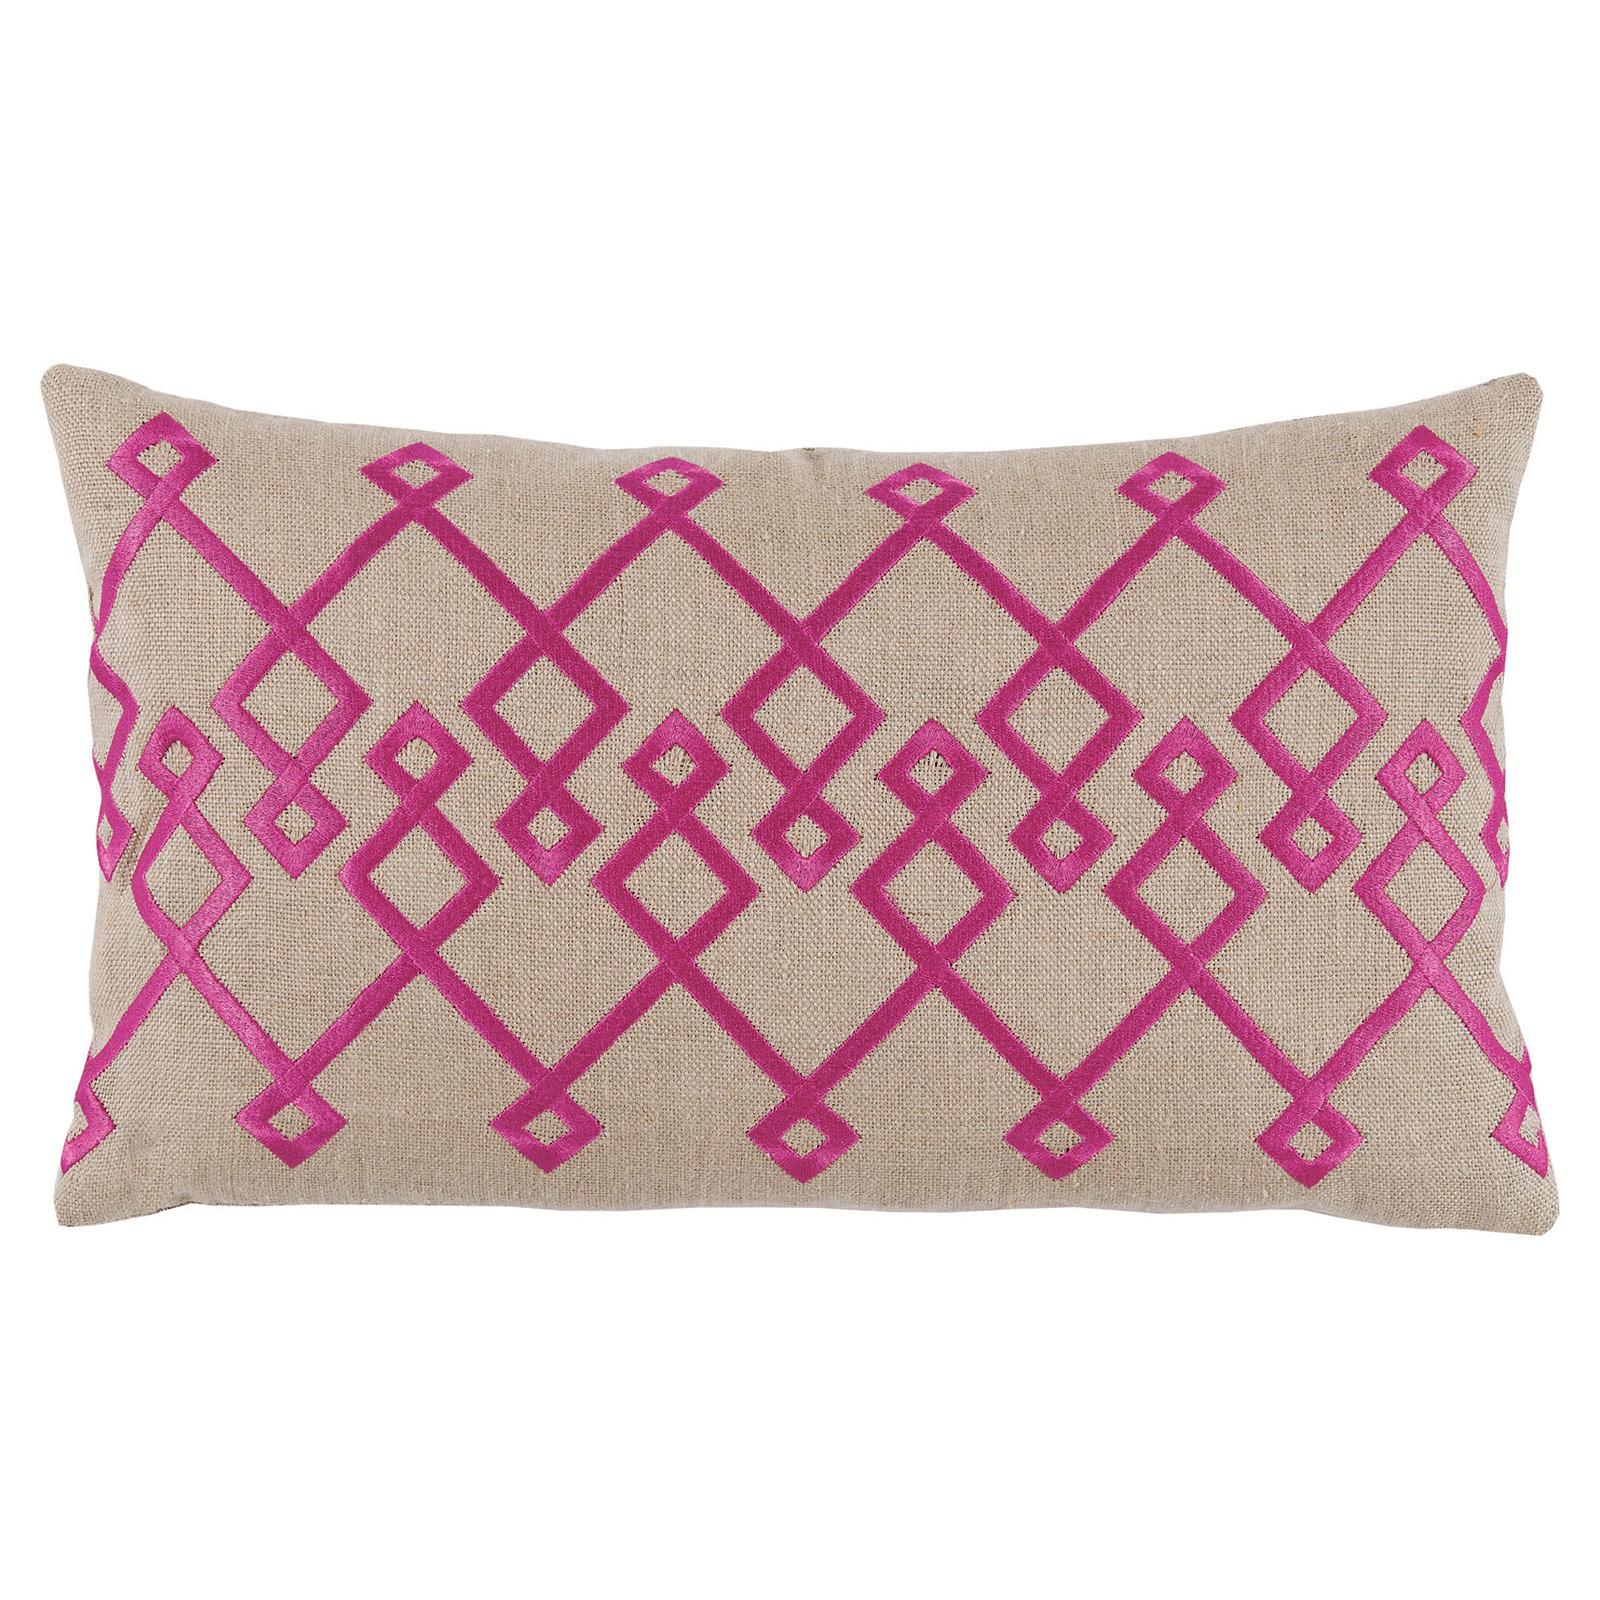 Steph Modern Fuchsia Chevron Stitch Beige Pillow - 13x22